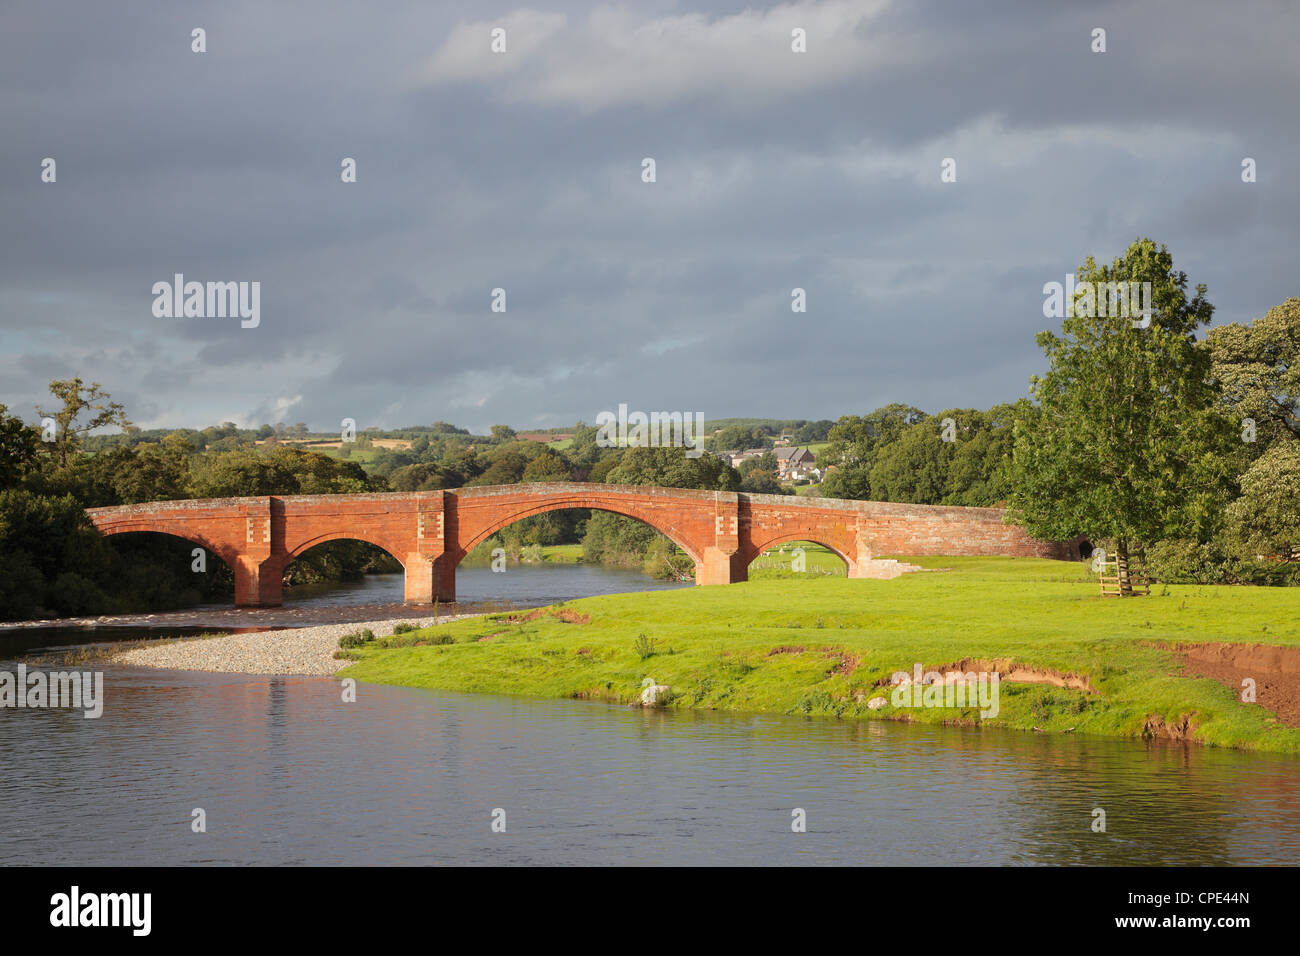 The Eden Bridge, Lazonby, Eden Valley Cumbria England UK - Stock Image